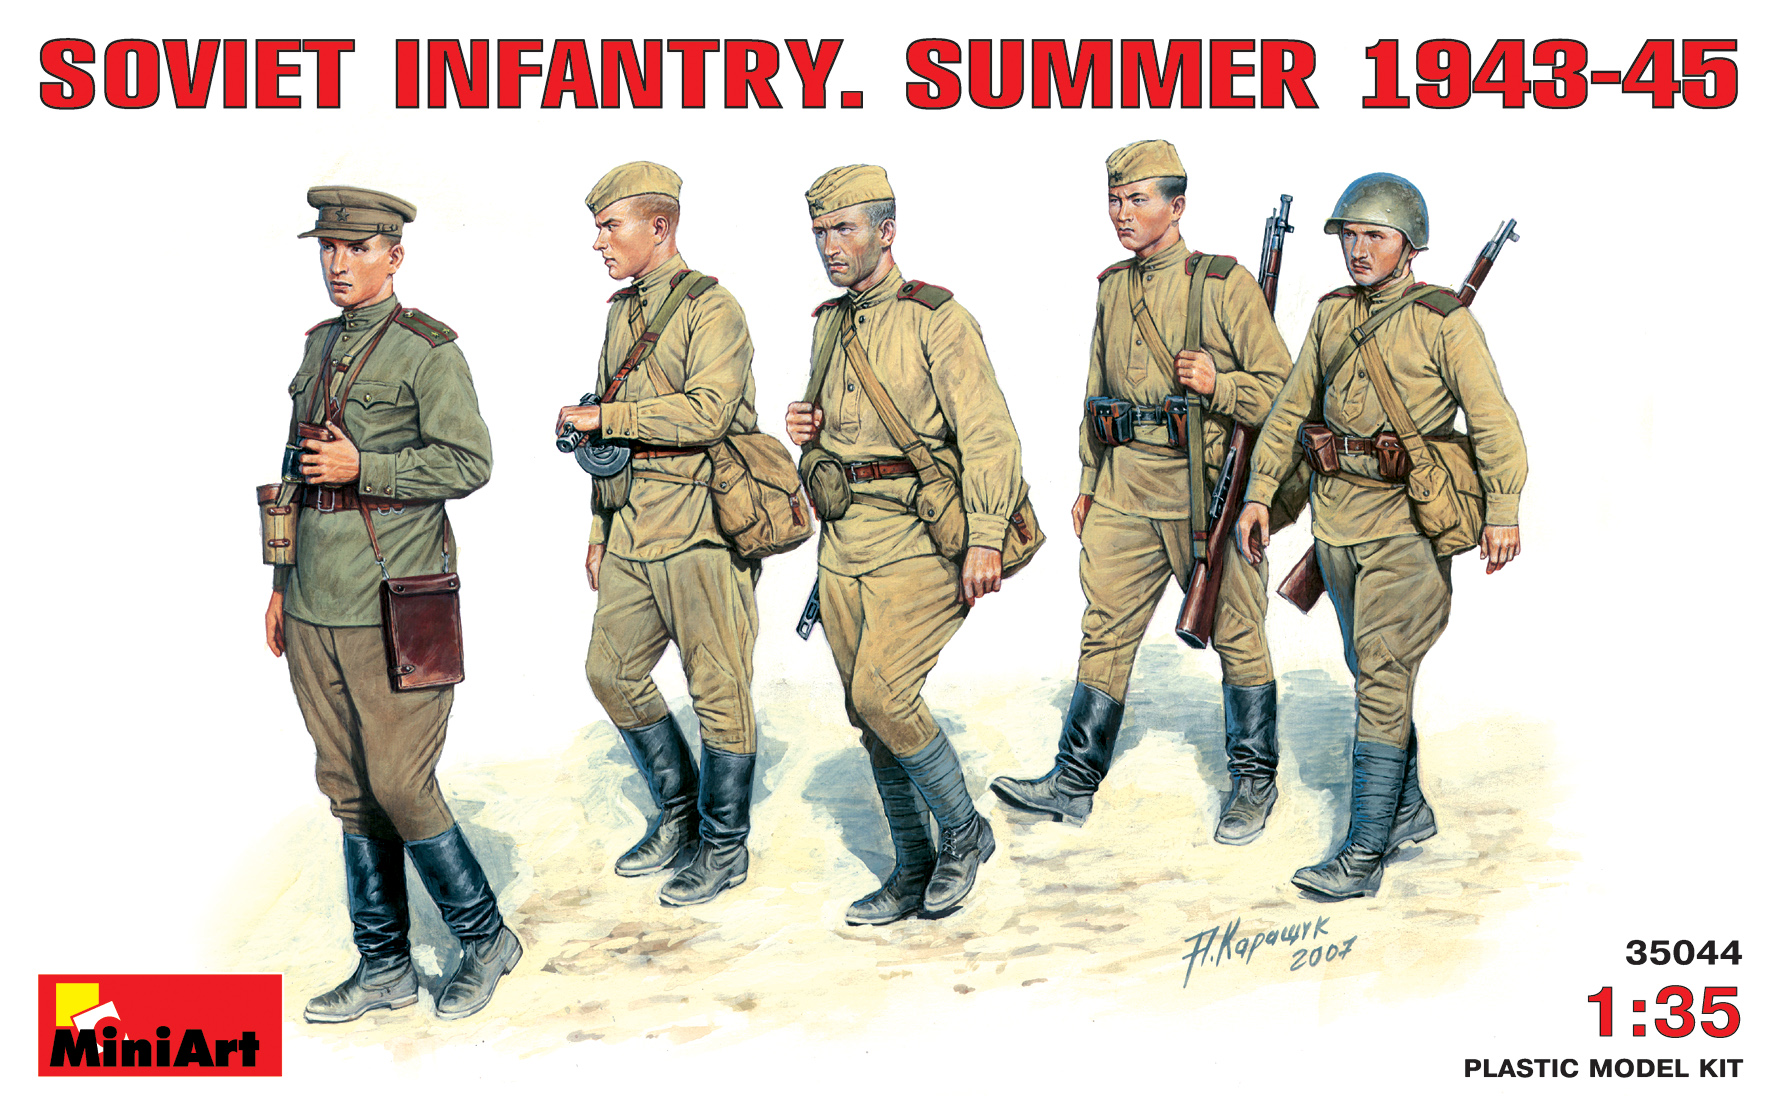 SOVIET INFANTRY. SUMMER 1943-45